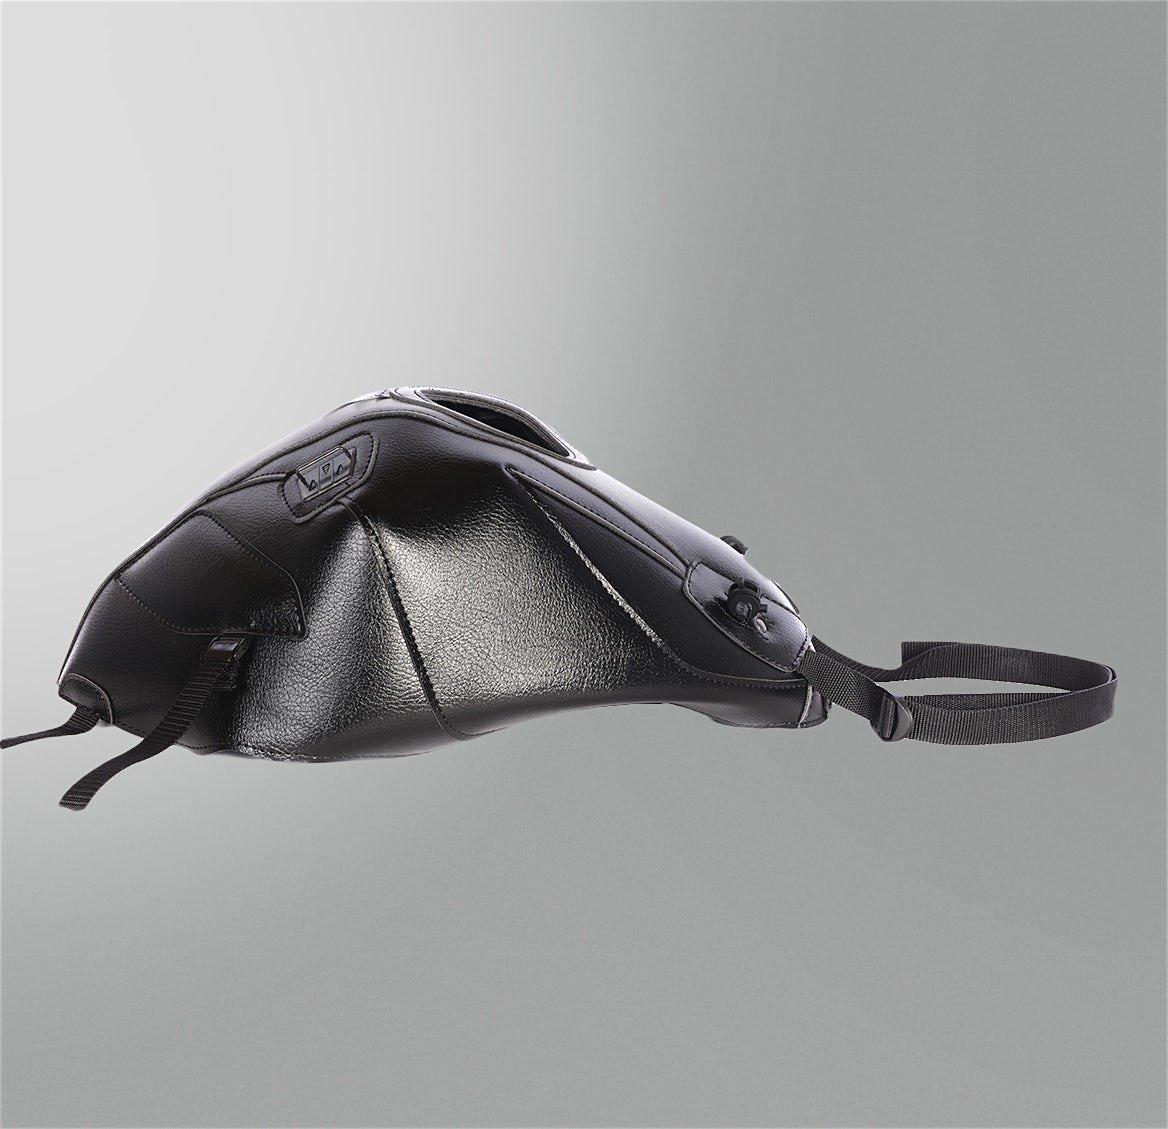 Bagster Tank Protector-Black (1620U)